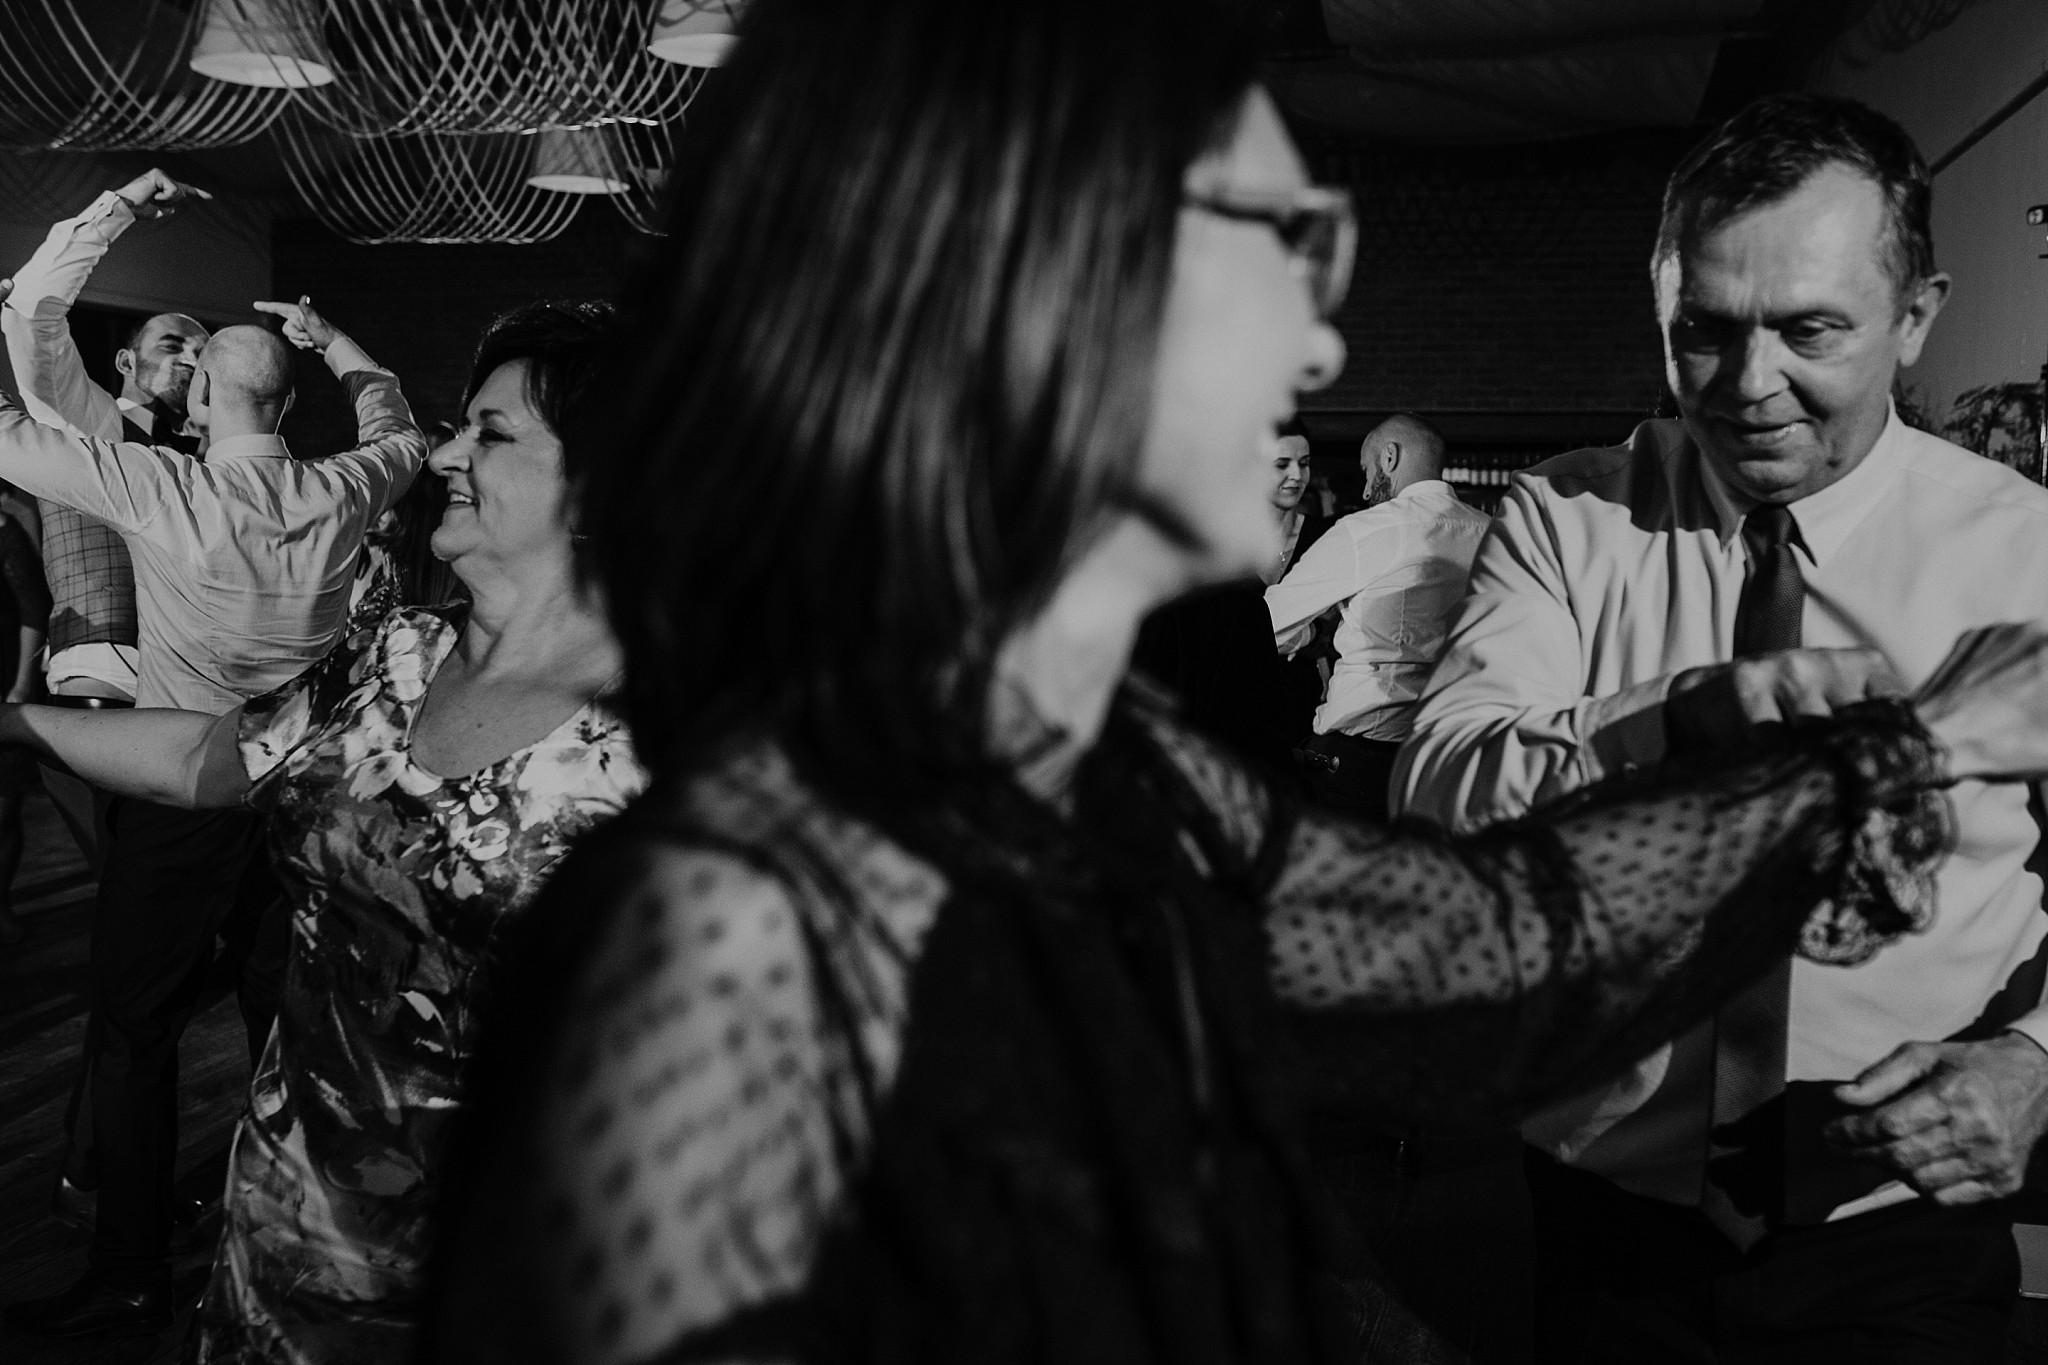 fotograf poznan wesele dobra truskawka piekne wesele pod poznaniem wesele w dobrej truskawce piekna para mloda slub marzen slub koronawirus slub listopad wesele koronawirus 481